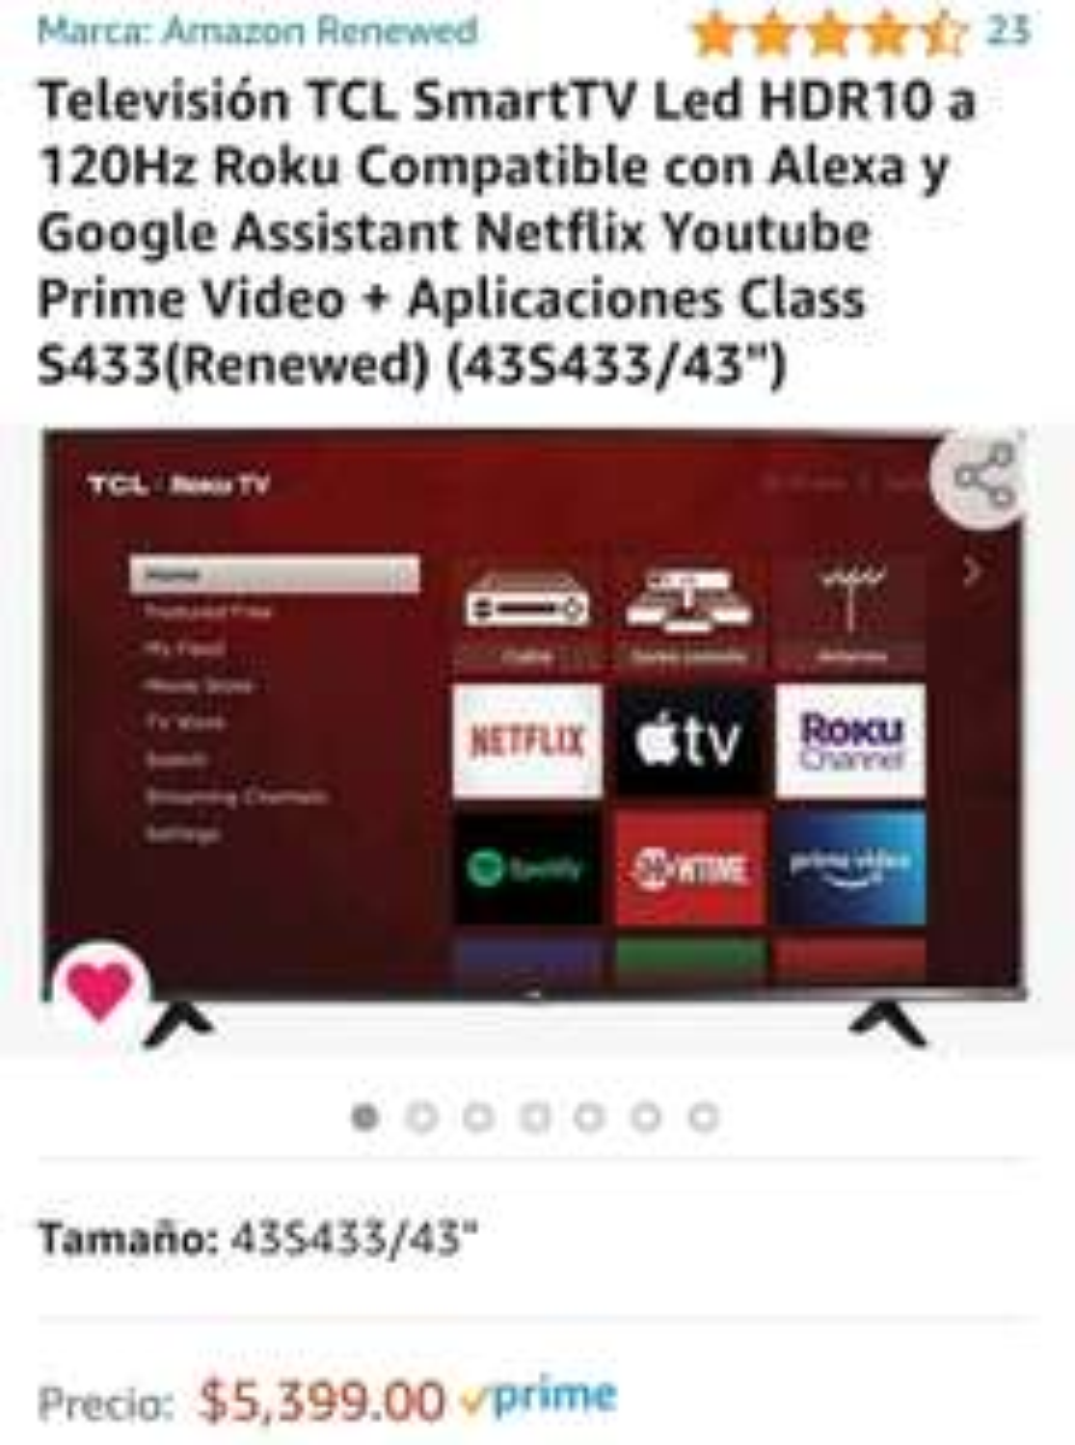 "Amazon: TCL smartTV 43"", renewed, 4K, 120ghz, HDR10"